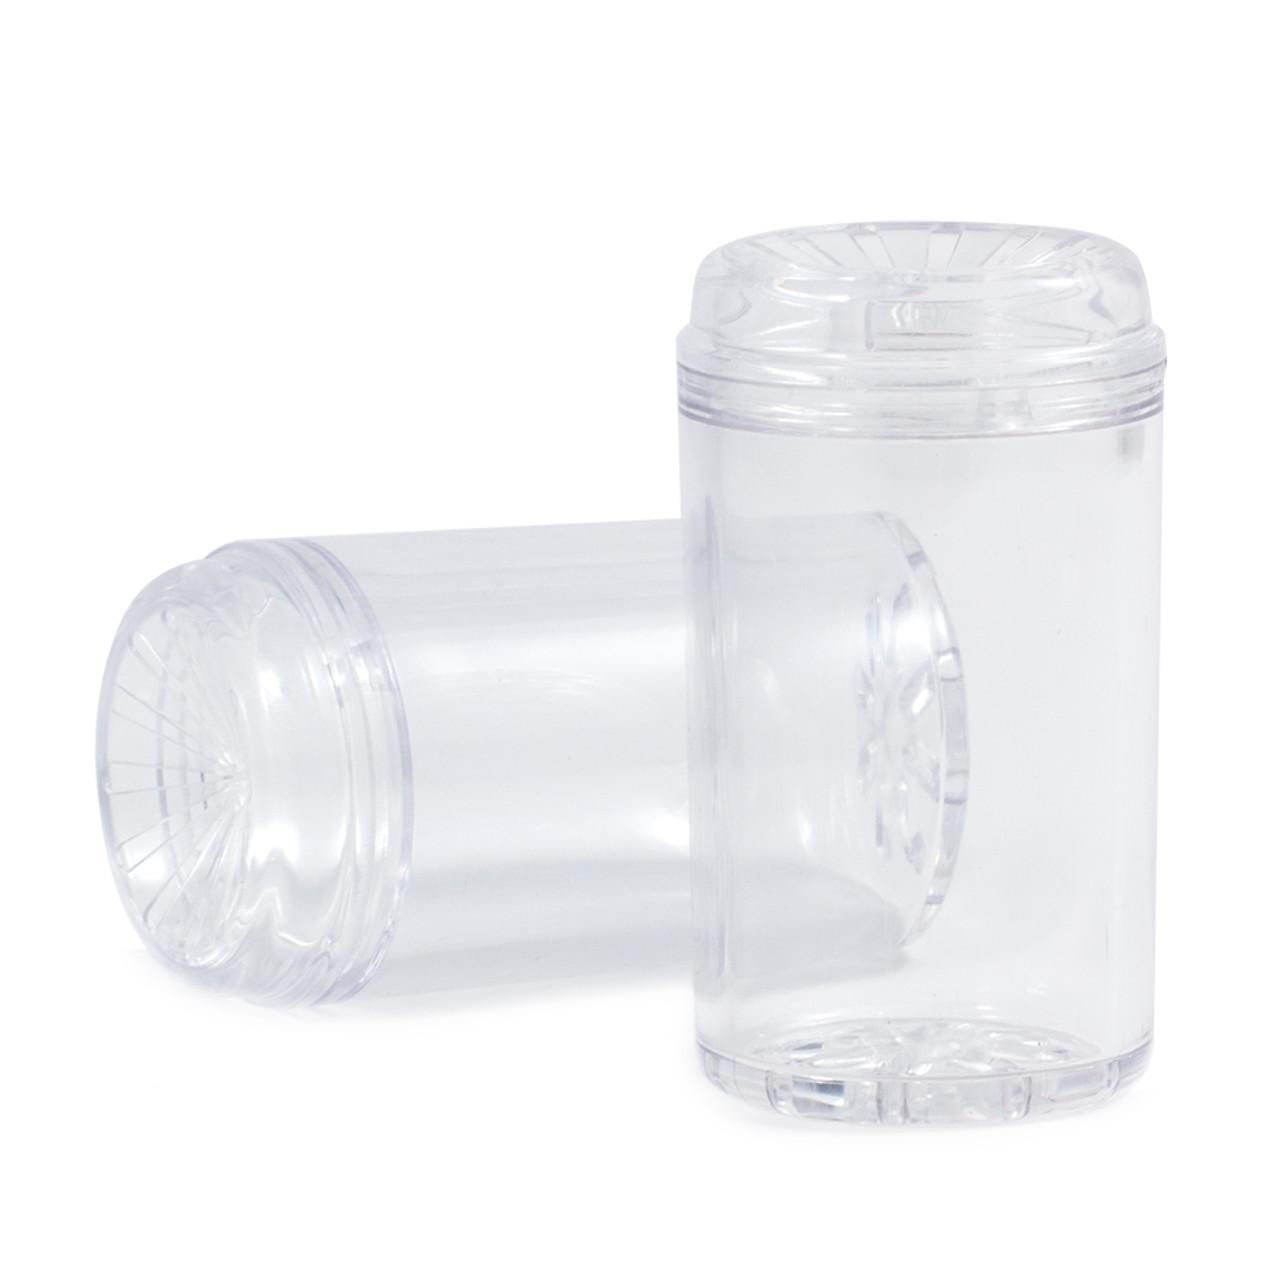 Dry Ice Cage